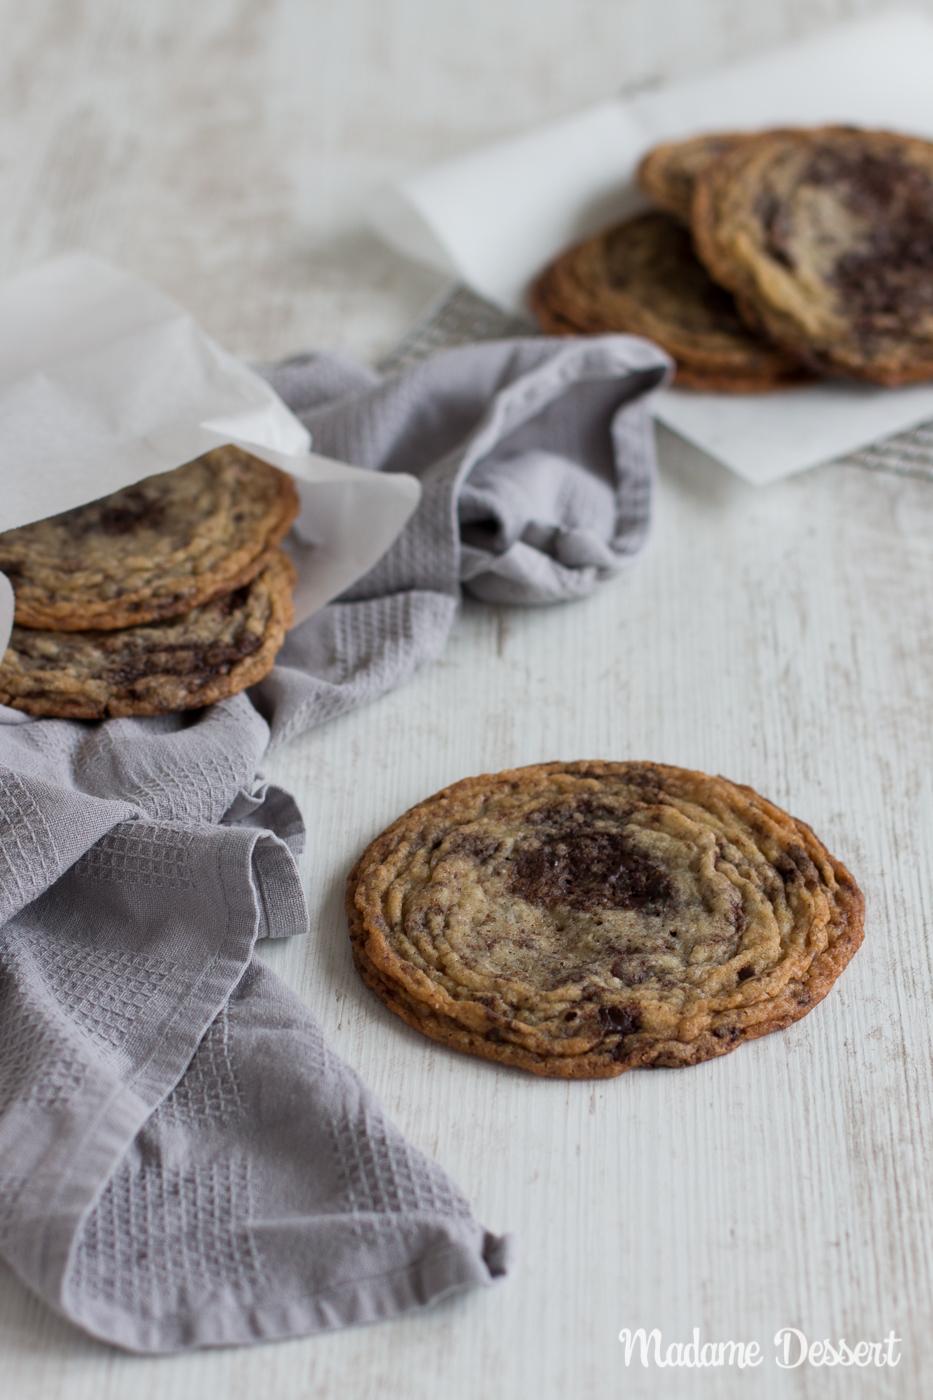 Crispy Crinkled Chocolate Chip Cookies | Madame Dessert